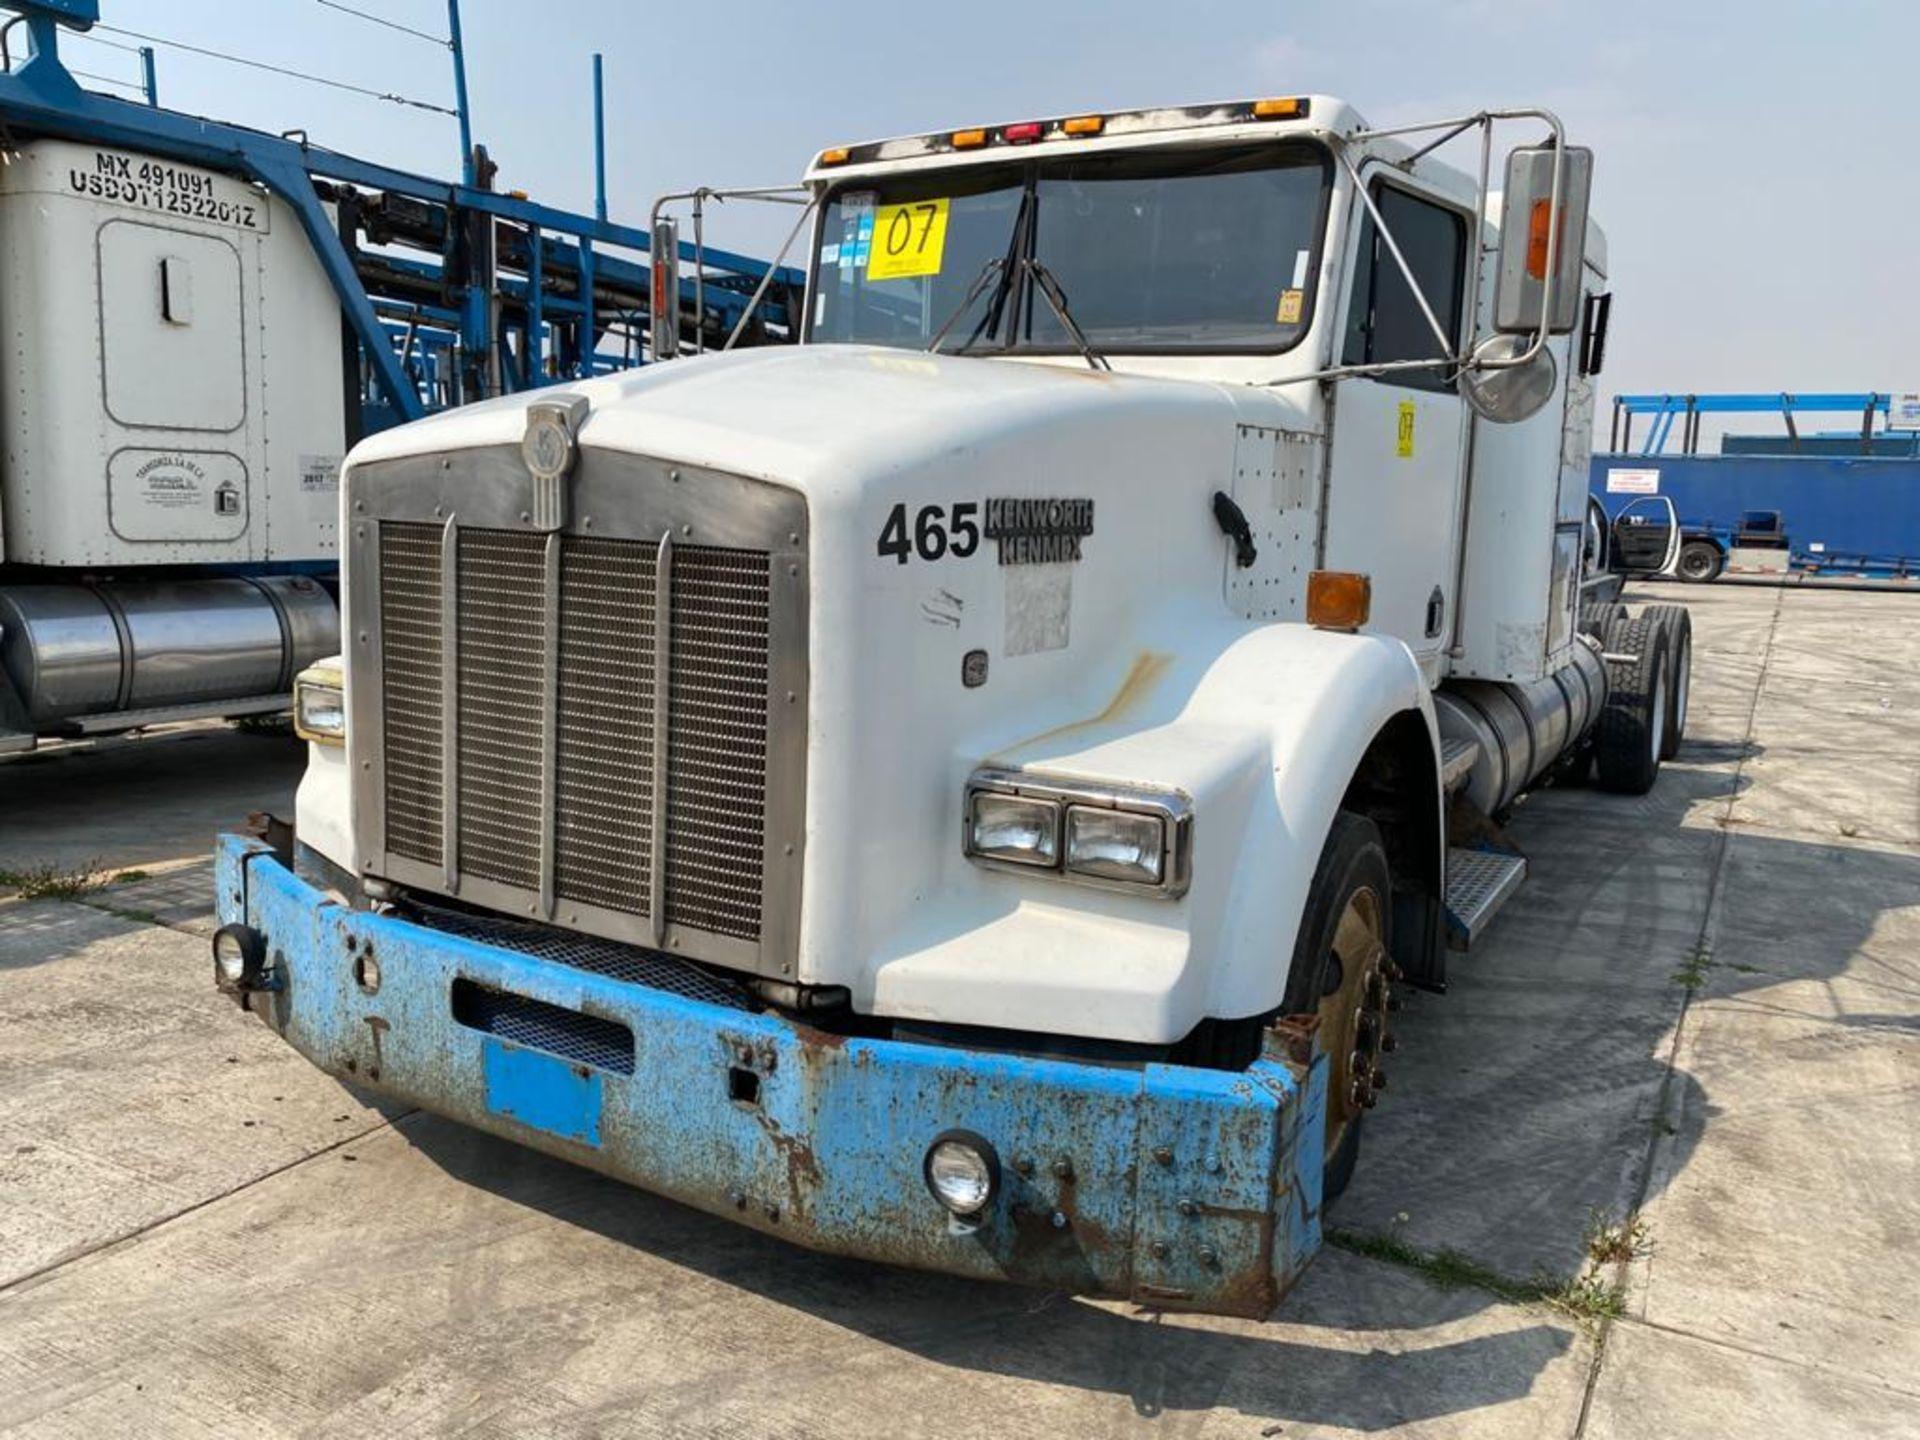 1999 Kenworth Sleeper truck tractor, standard transmission of 18 speeds - Image 5 of 72